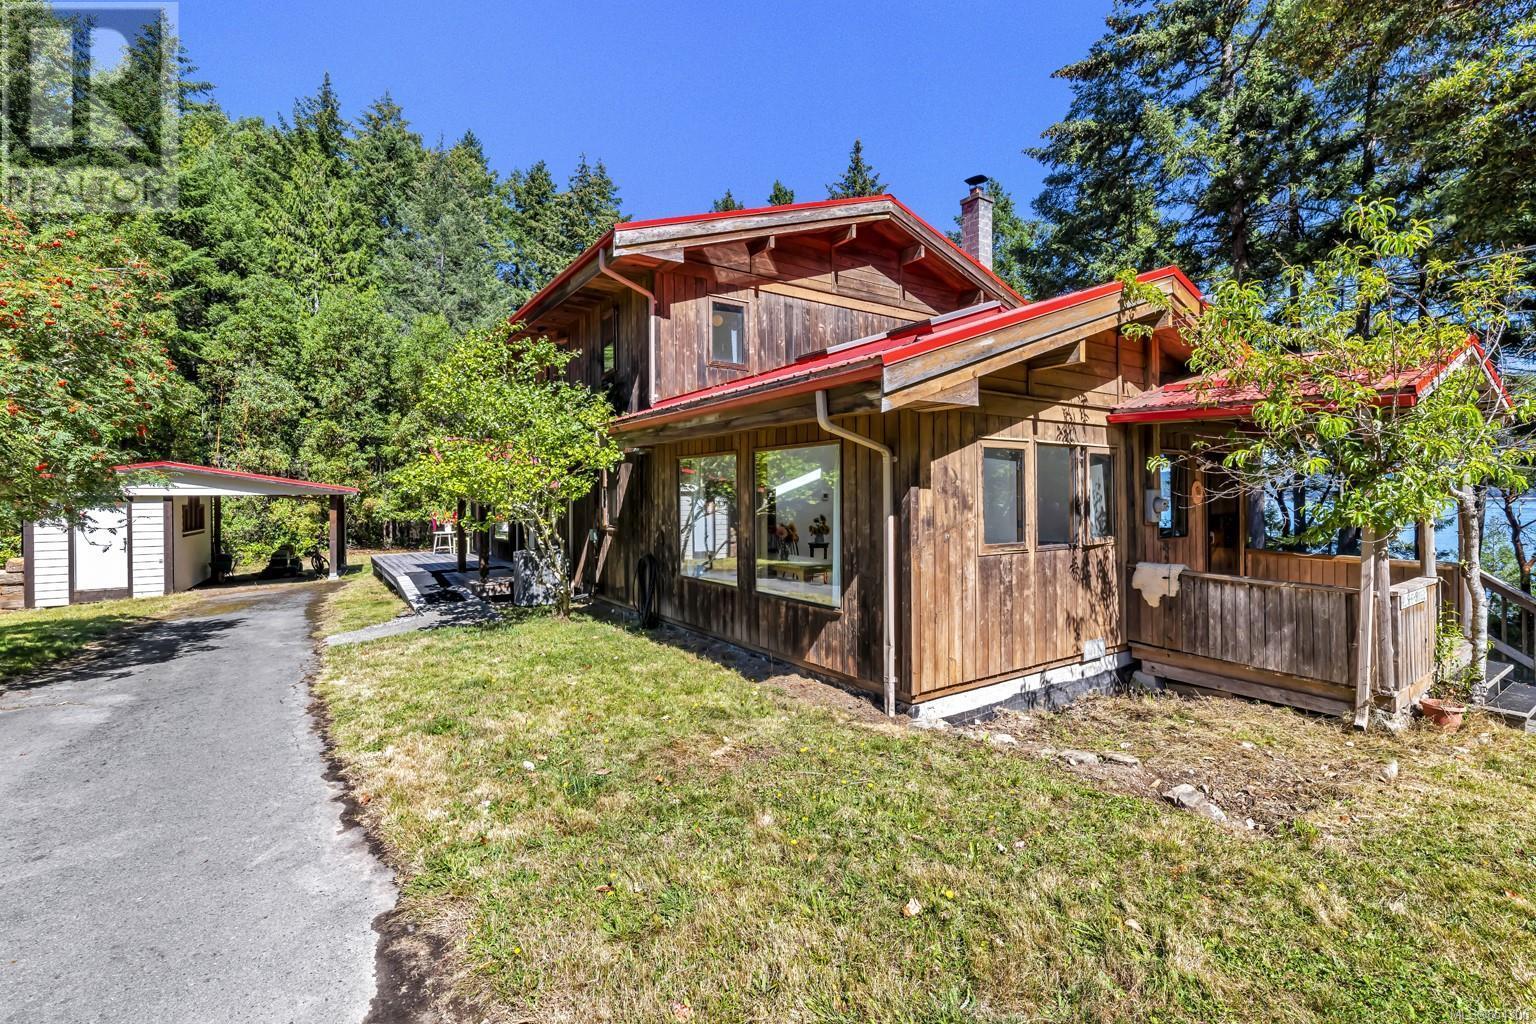 2521 North End RdSalt Spring, British Columbia  V8K 1A9 - Photo 64 - 854306